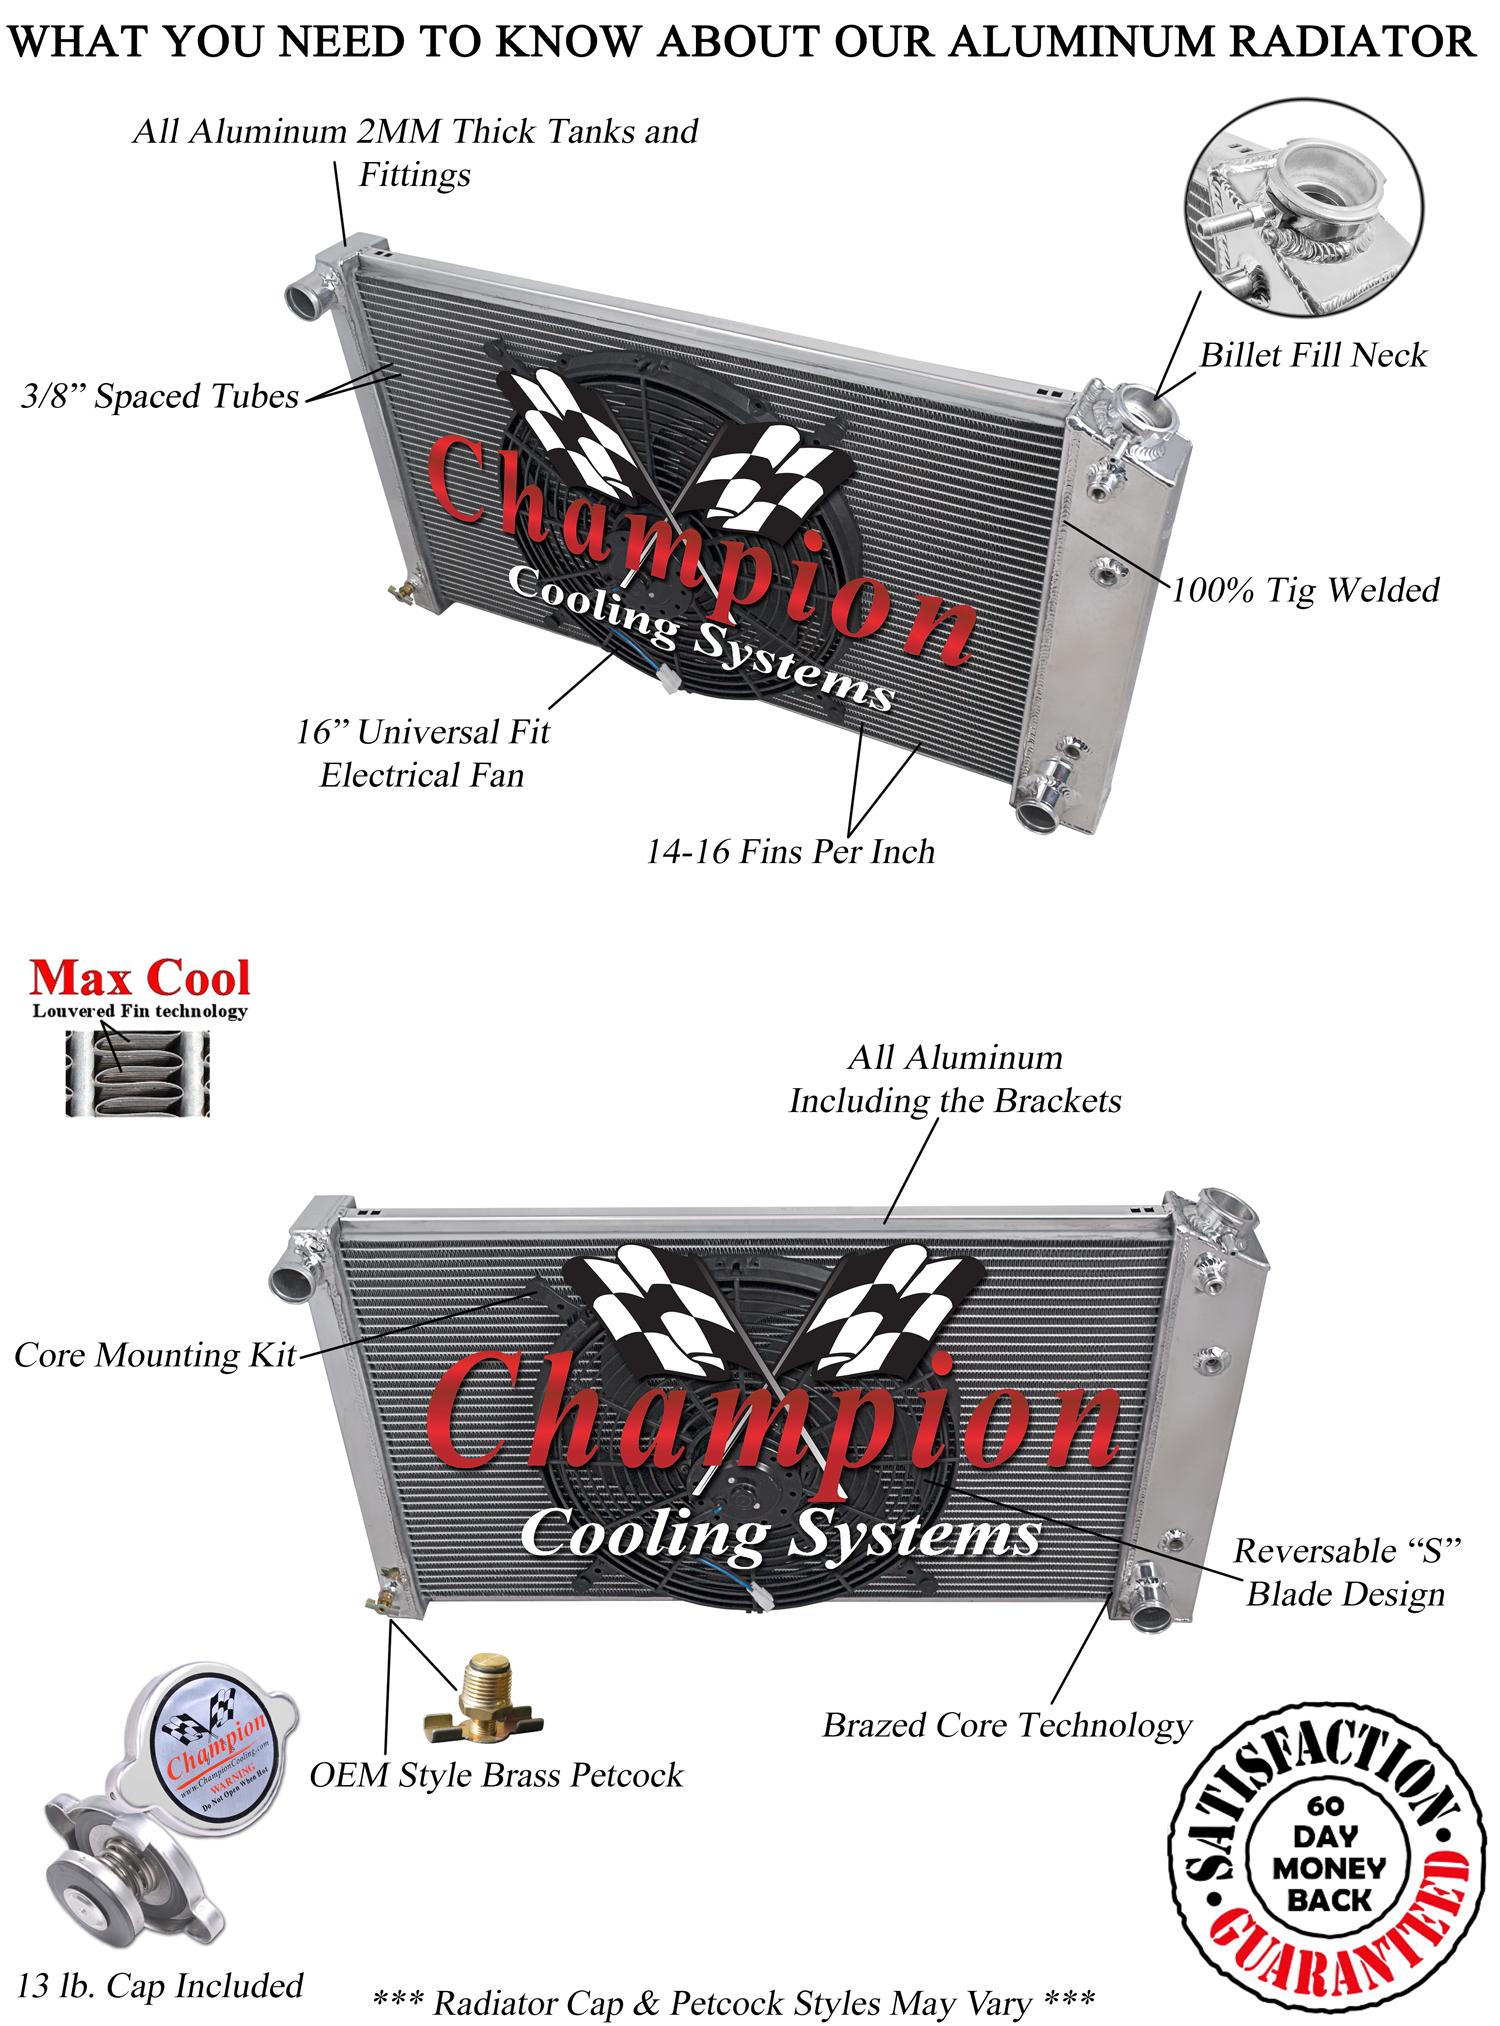 https://www.championcooling.com/photos/Photos%20White/With%20Fans/Combos/161/161_162_16fan_white_Diagram_Champion.jpg